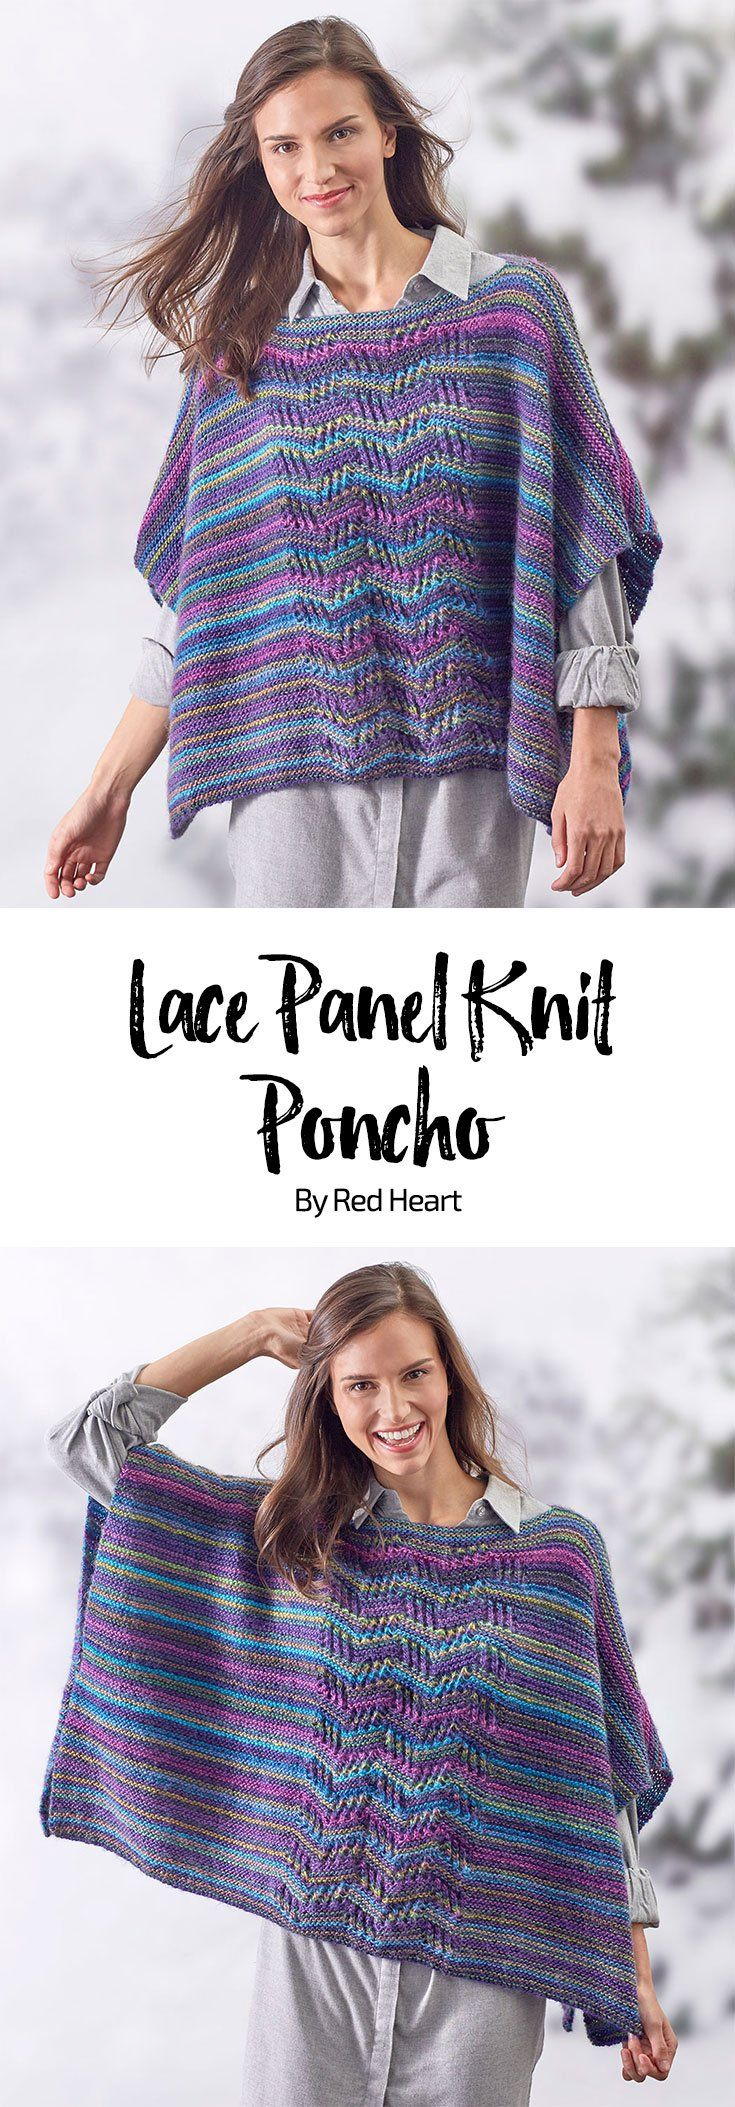 Lace Panel Knit Poncho free knit pattern in Unforgettable yarn.